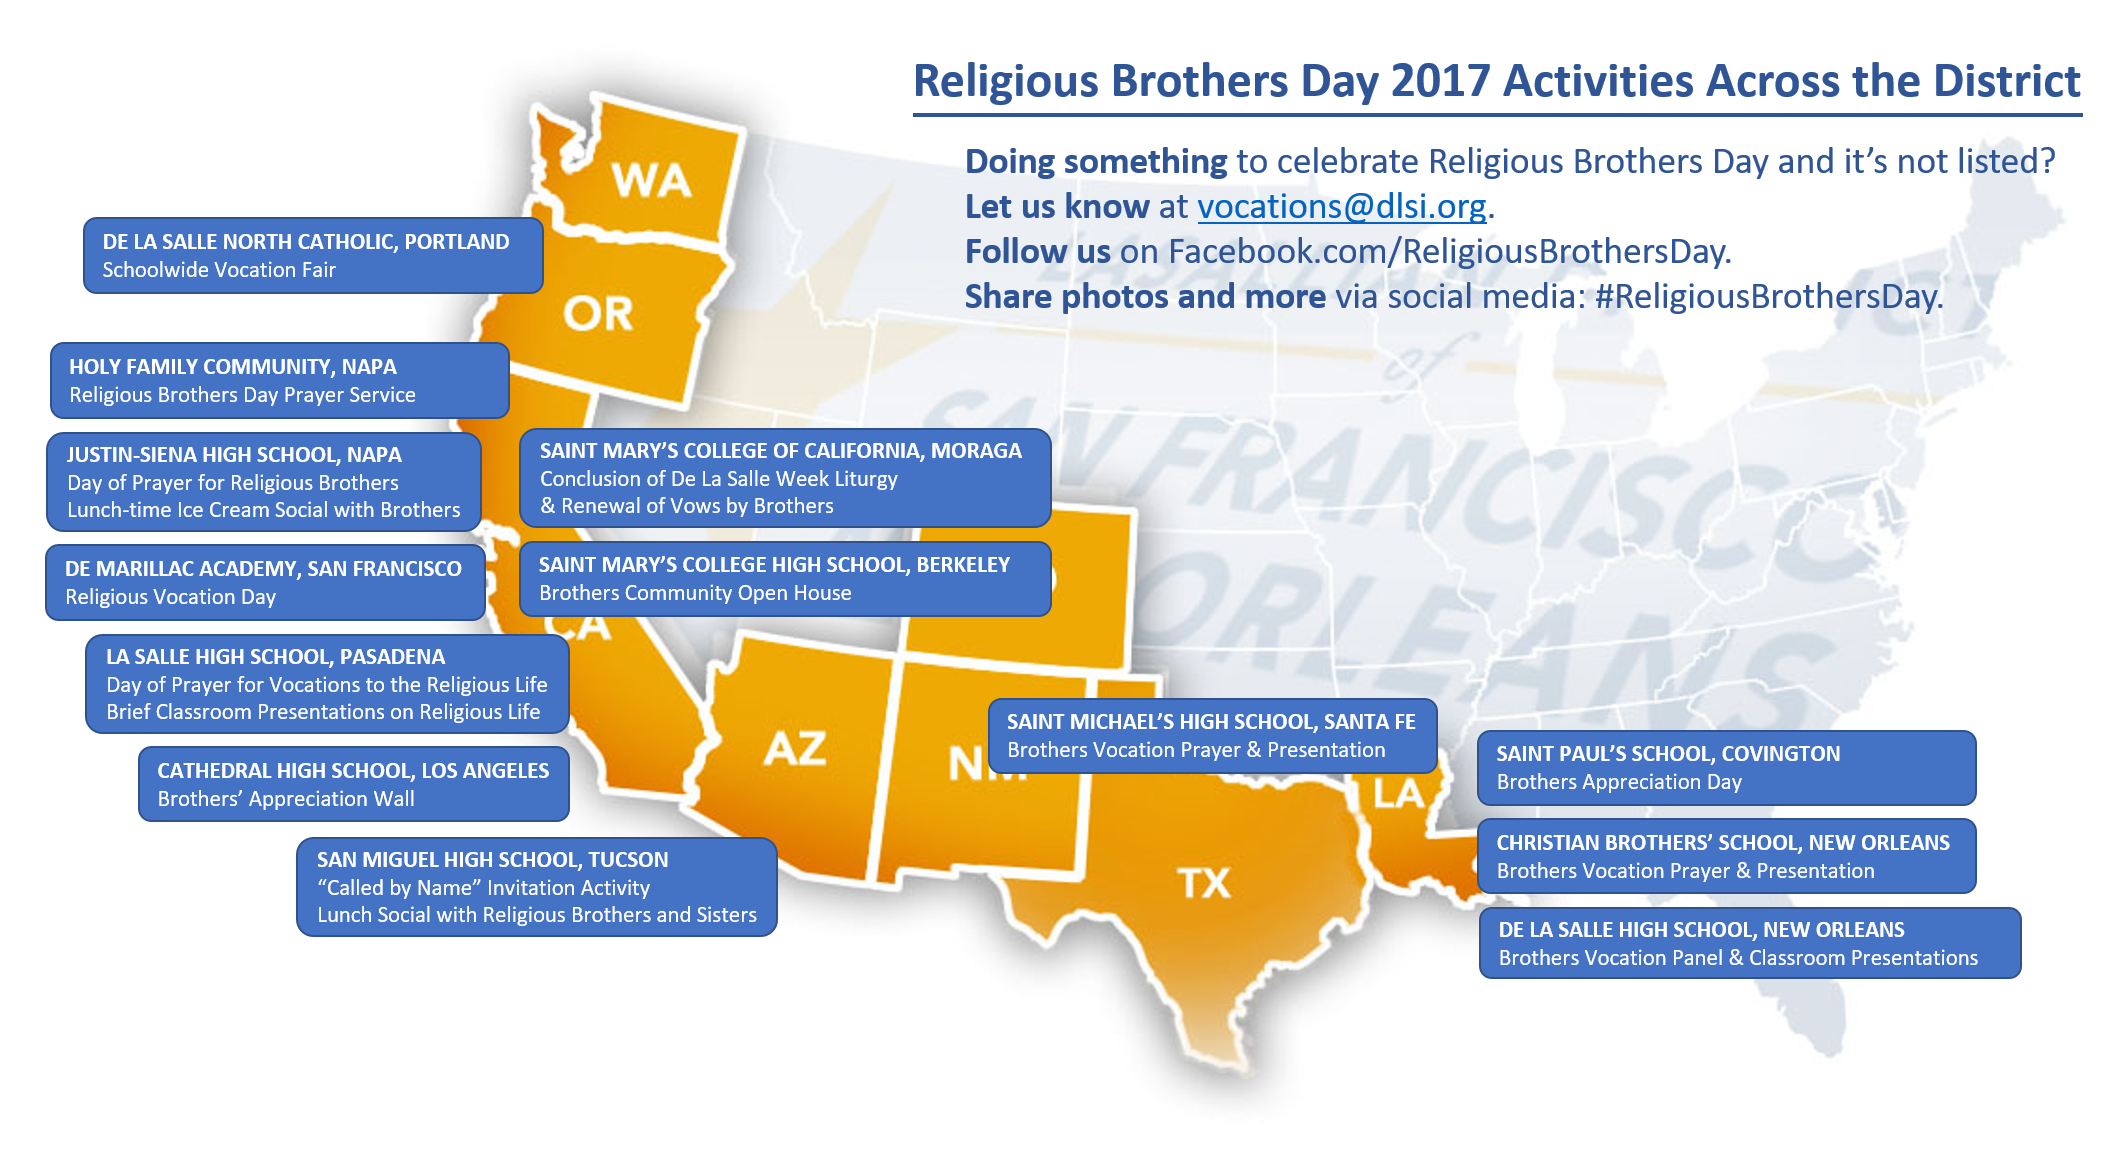 RBD 2017 Activities Map